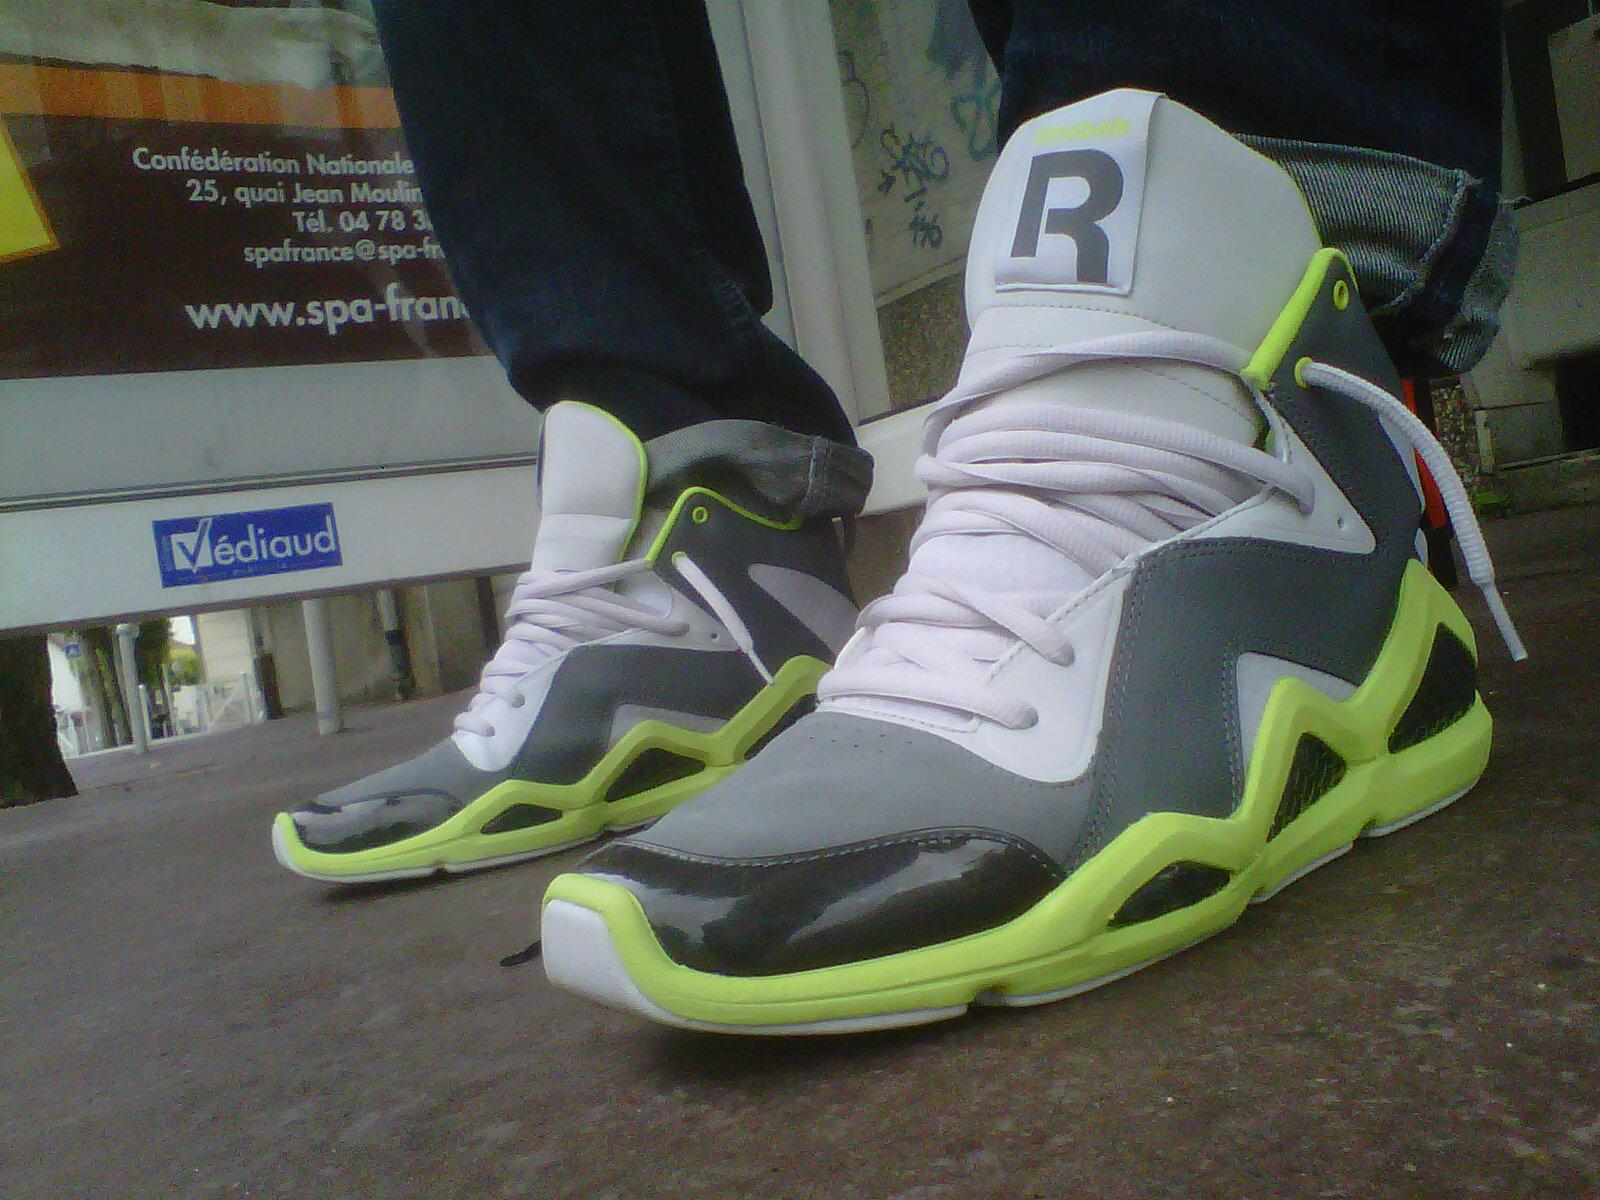 3926a2a0f36 My Sneaker s Collection  Reebok Kamikaze III Mid NC (Rivet Grey ...